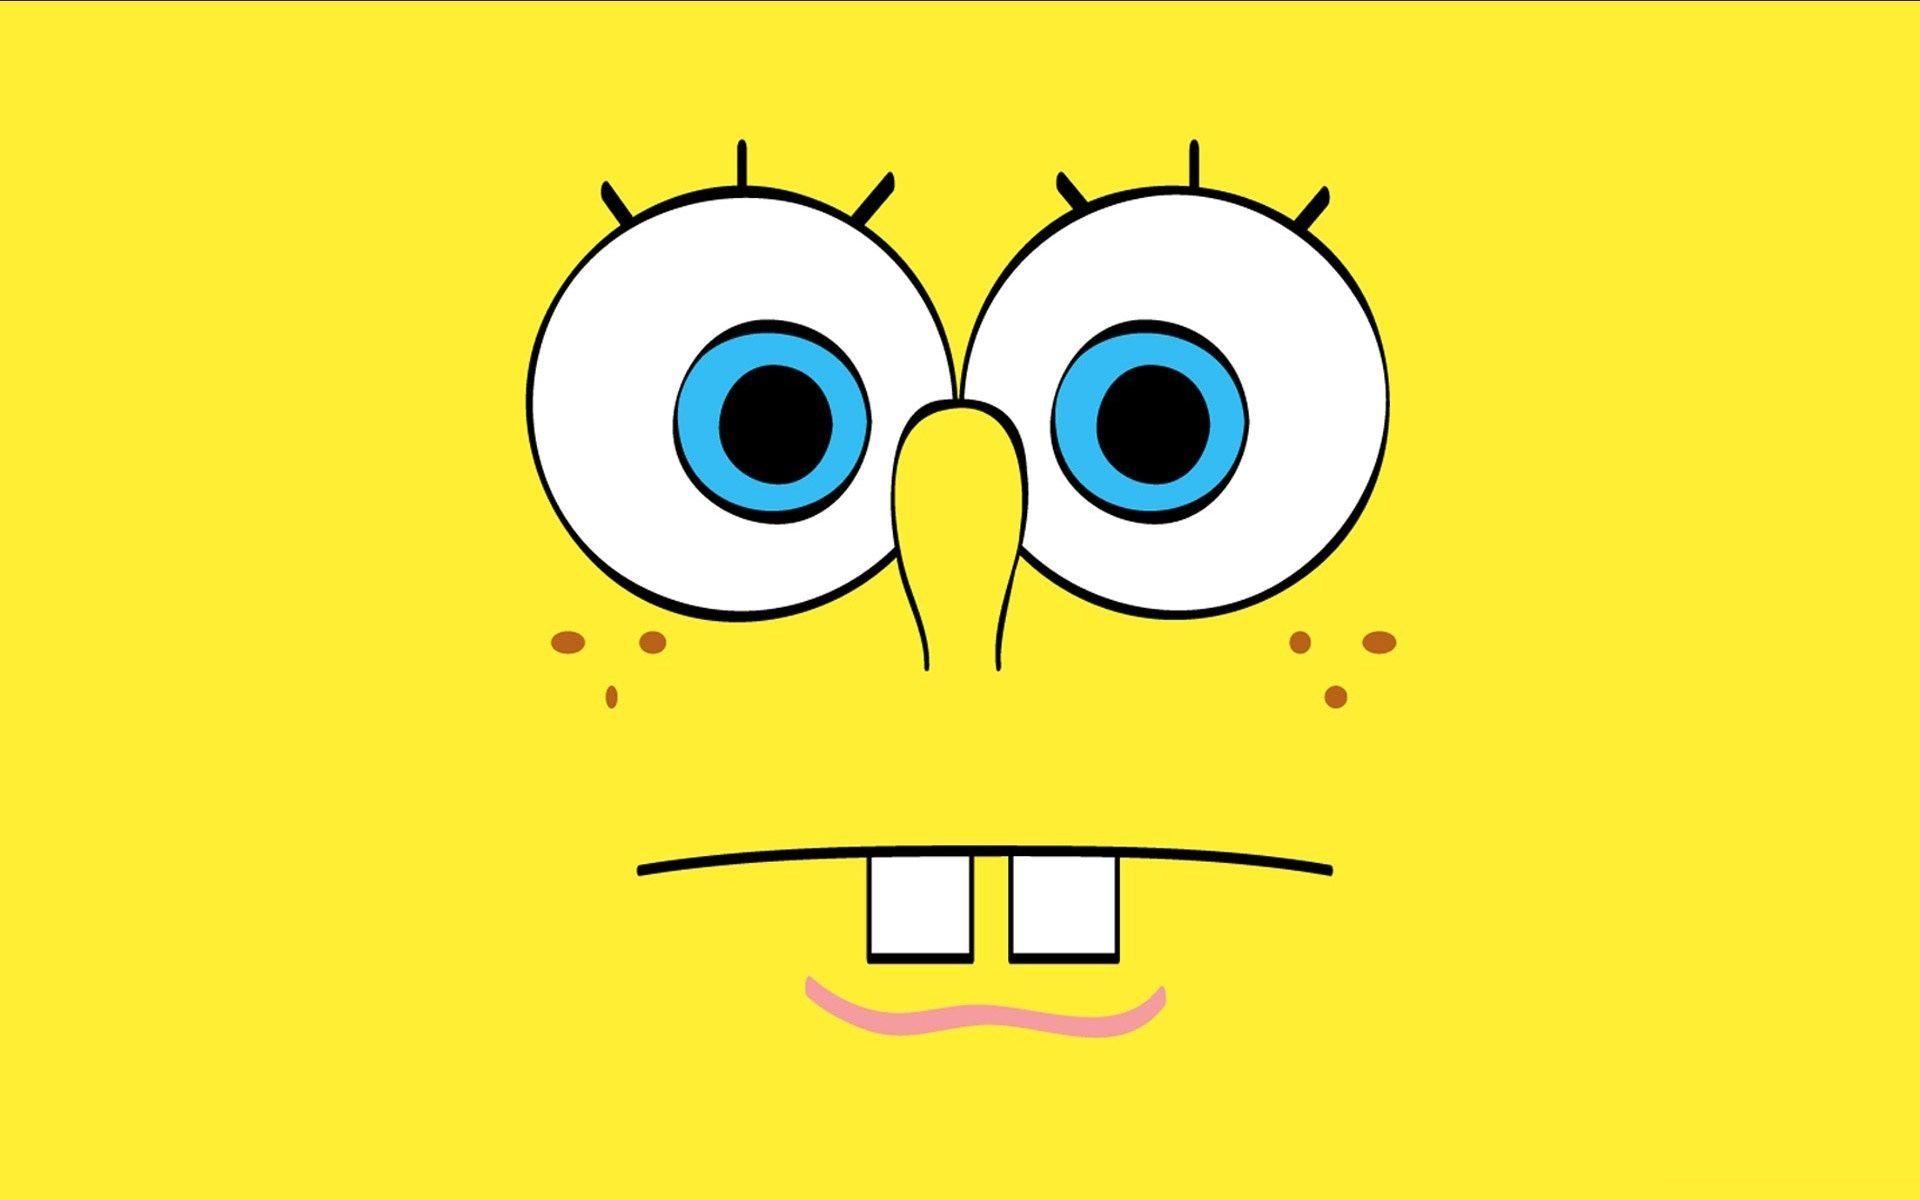 gary and spongebob wallpaper cute spongebob wallpapers | hd